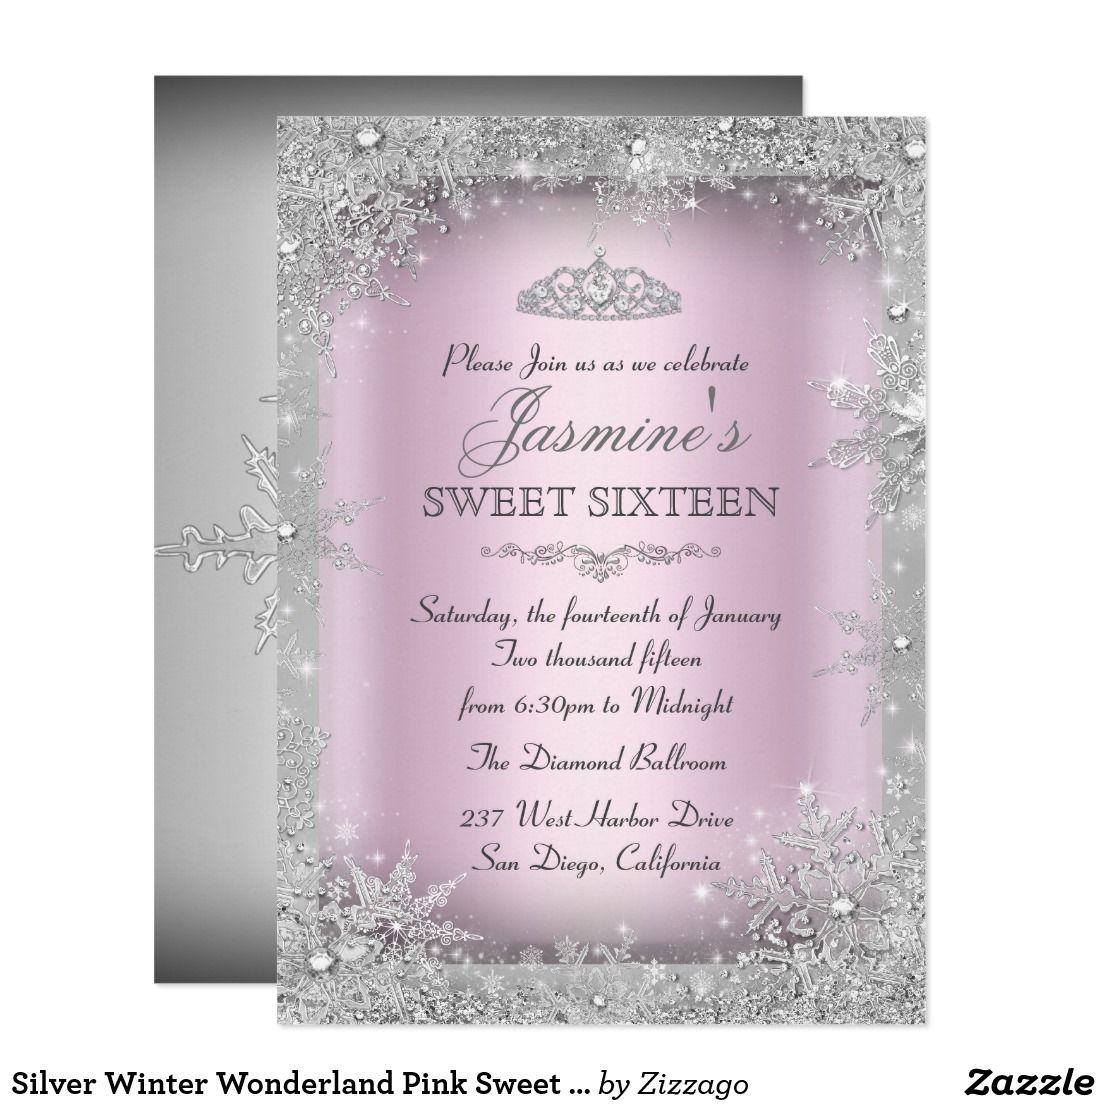 Silver Winter Wonderland Pink Sweet 16 Invitation   Pink sweet 16 ...